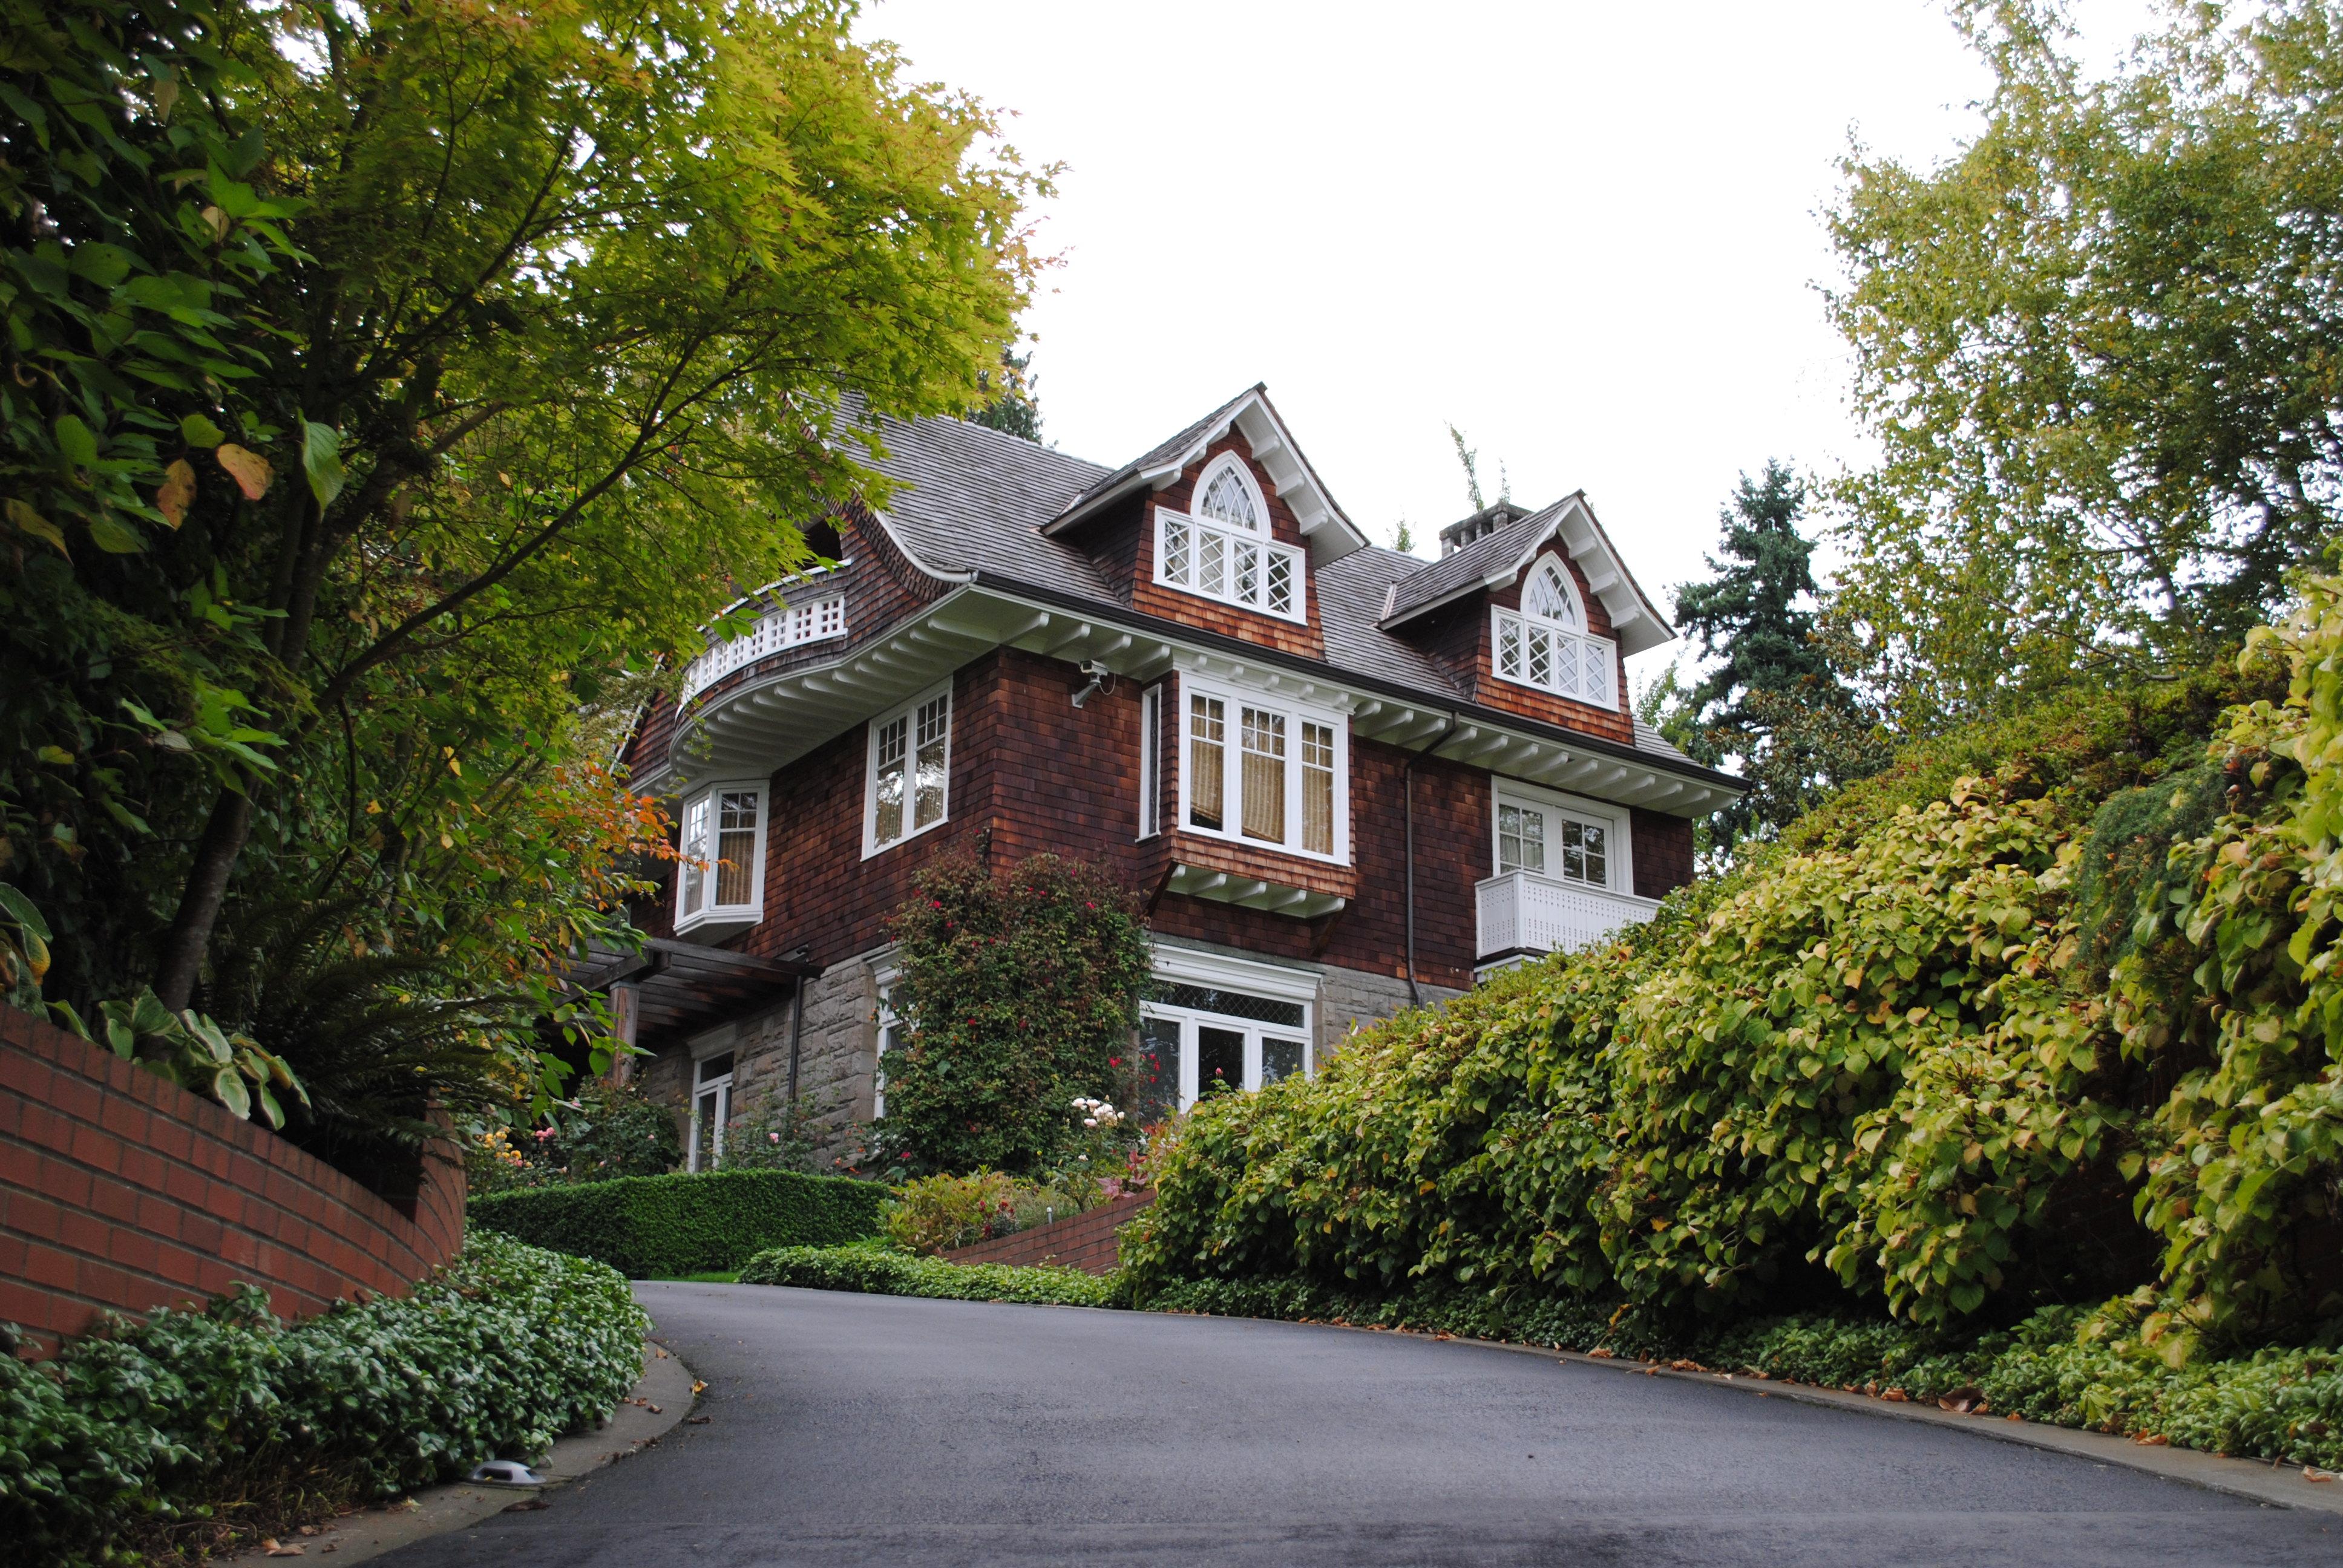 Kuća koja mi se svidela Kurt_Cobain%27s_House_1%2C_Lake_Washington_Boulevard%2C_Seattle%2C_WA